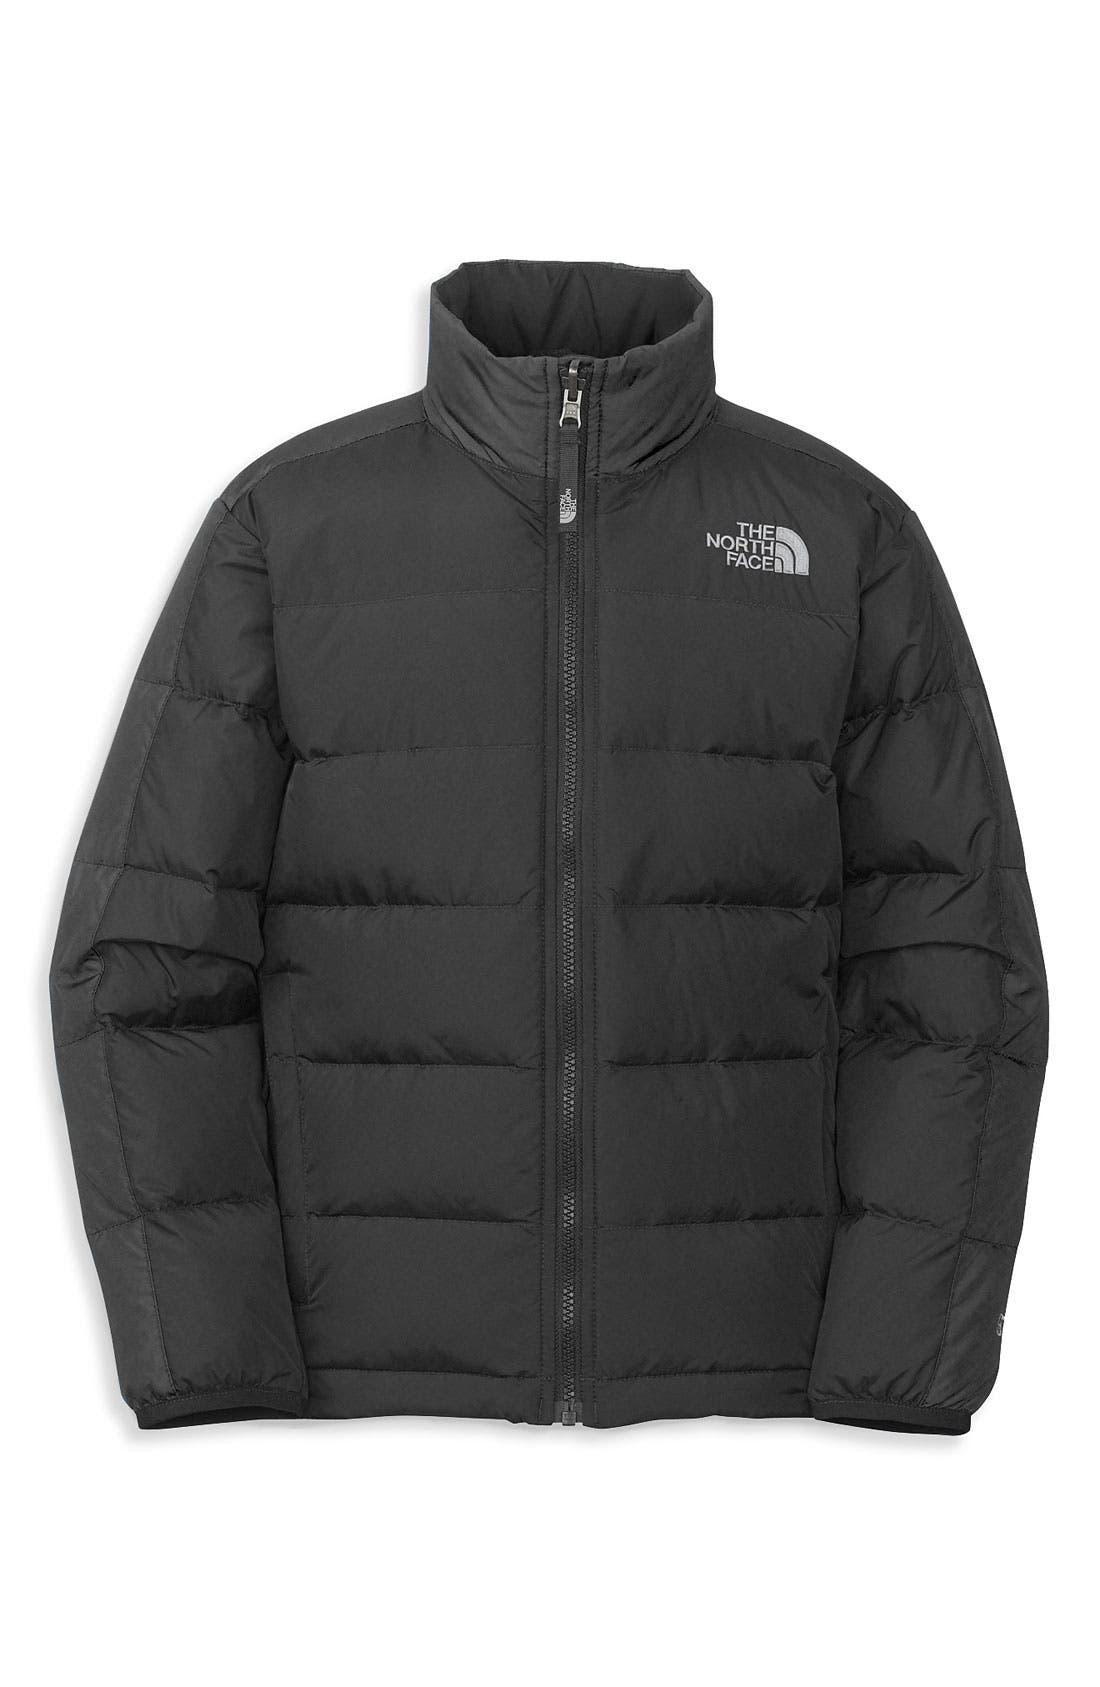 Main Image - The North Face 'Aconcagua' Jacket (Big Boys)